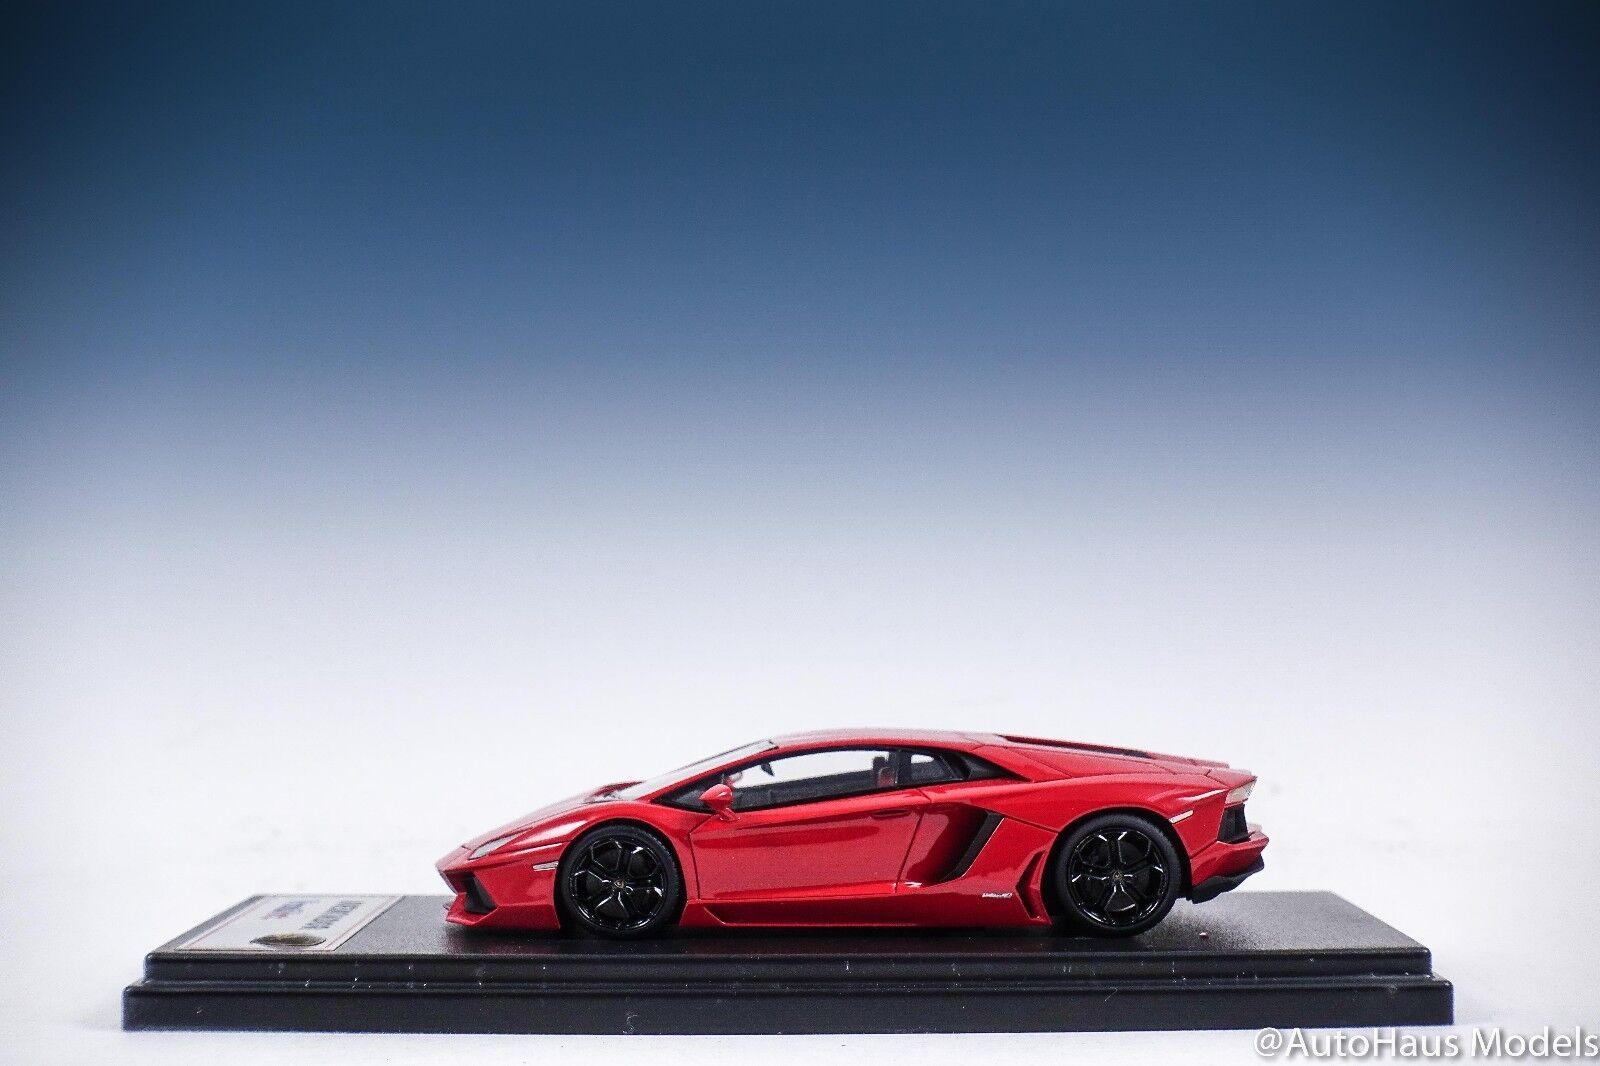 1   43 pantallas de cinta roja roja roja frontiart Lamborghini aventandor lp700 - 4 836